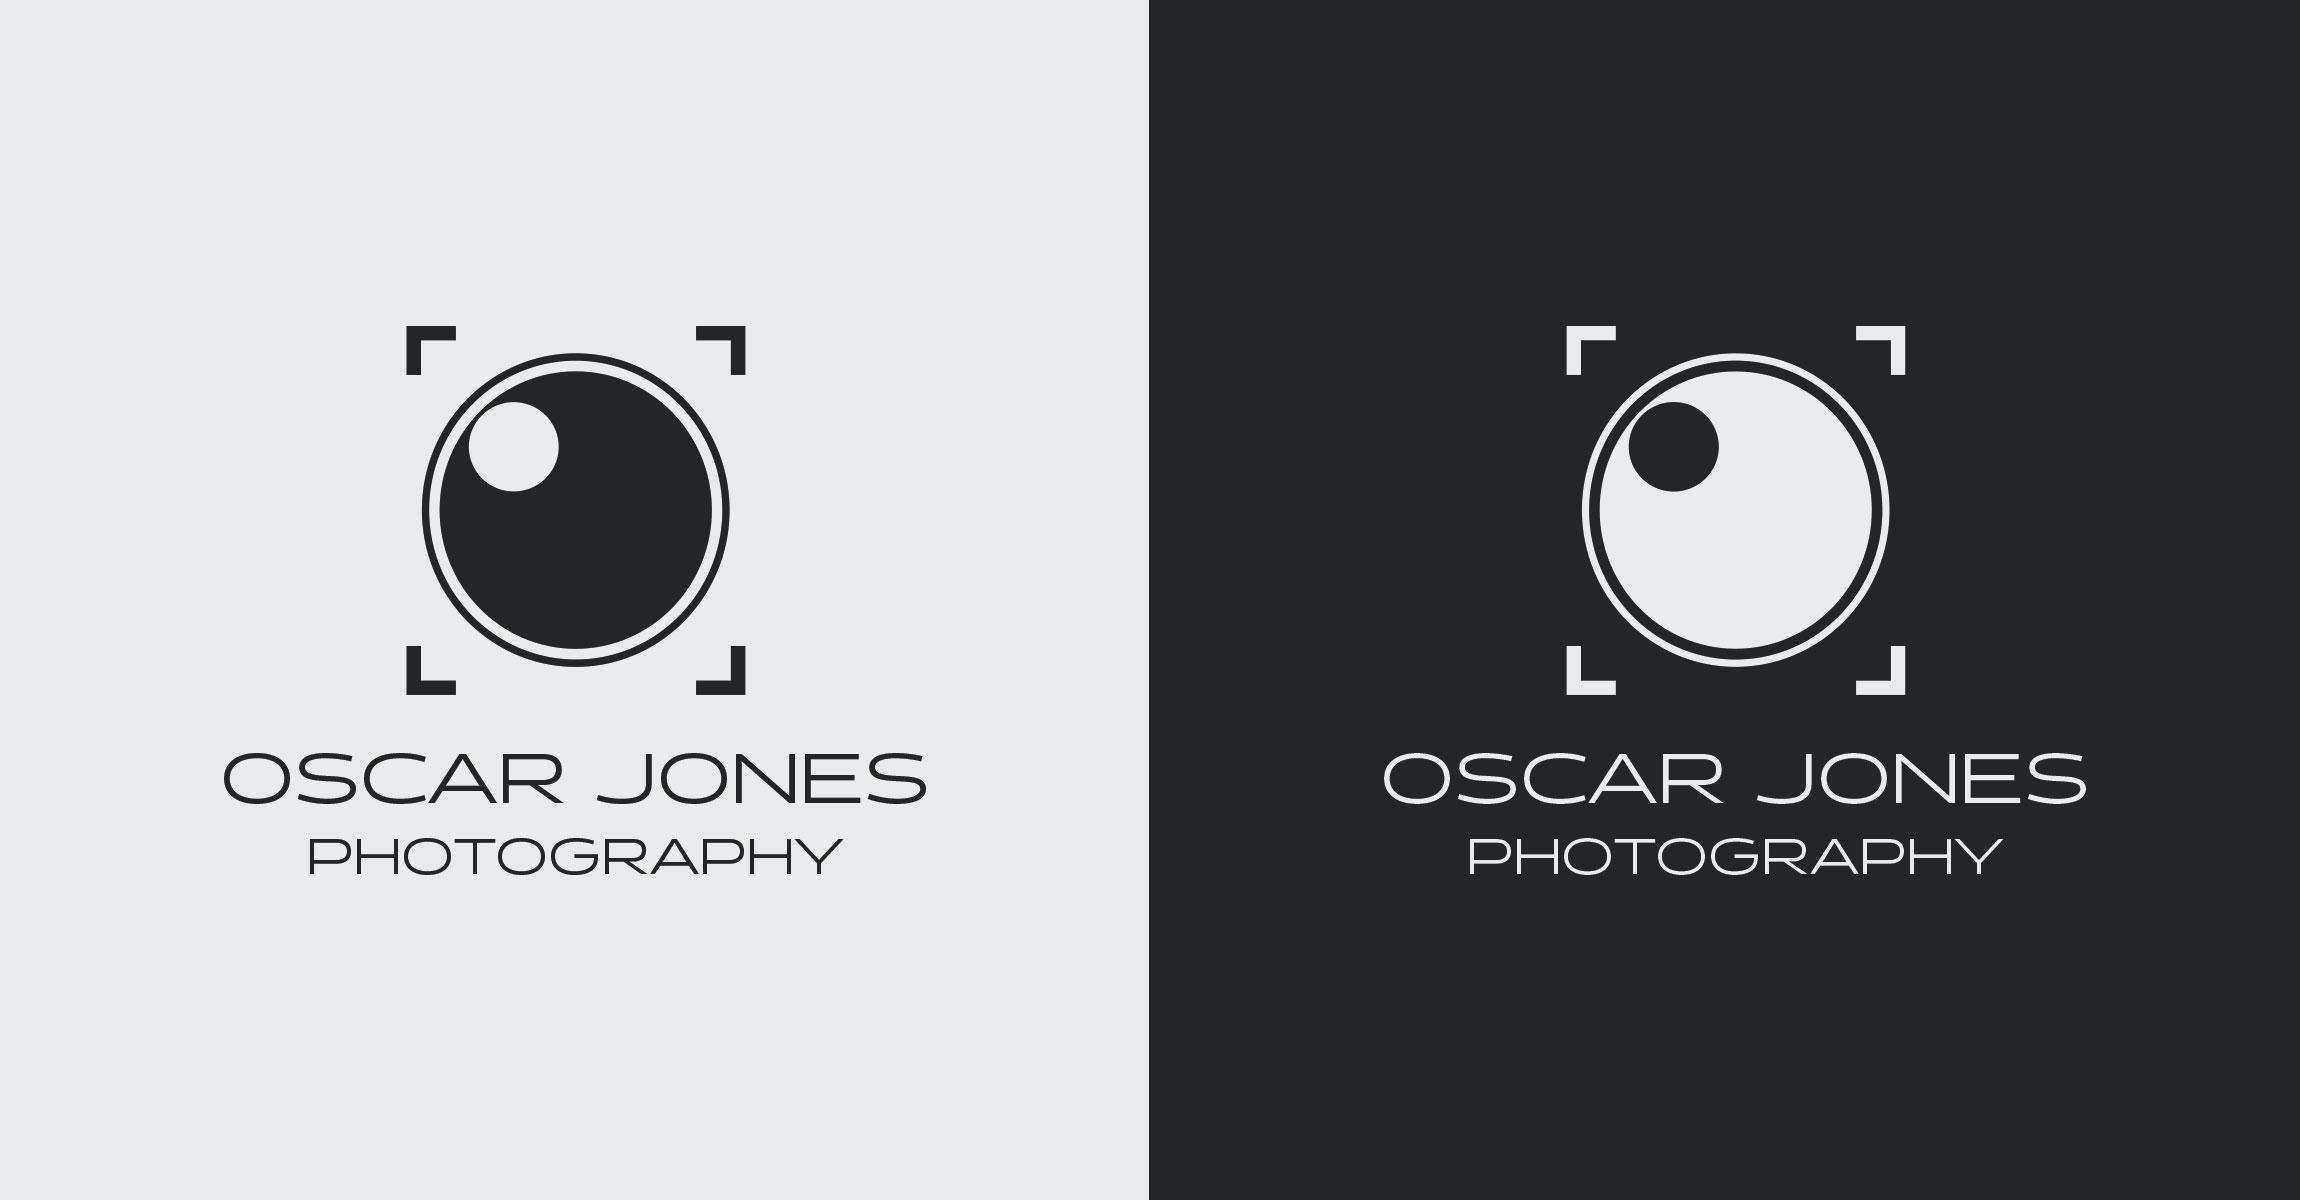 oscar-jones-black-and-white